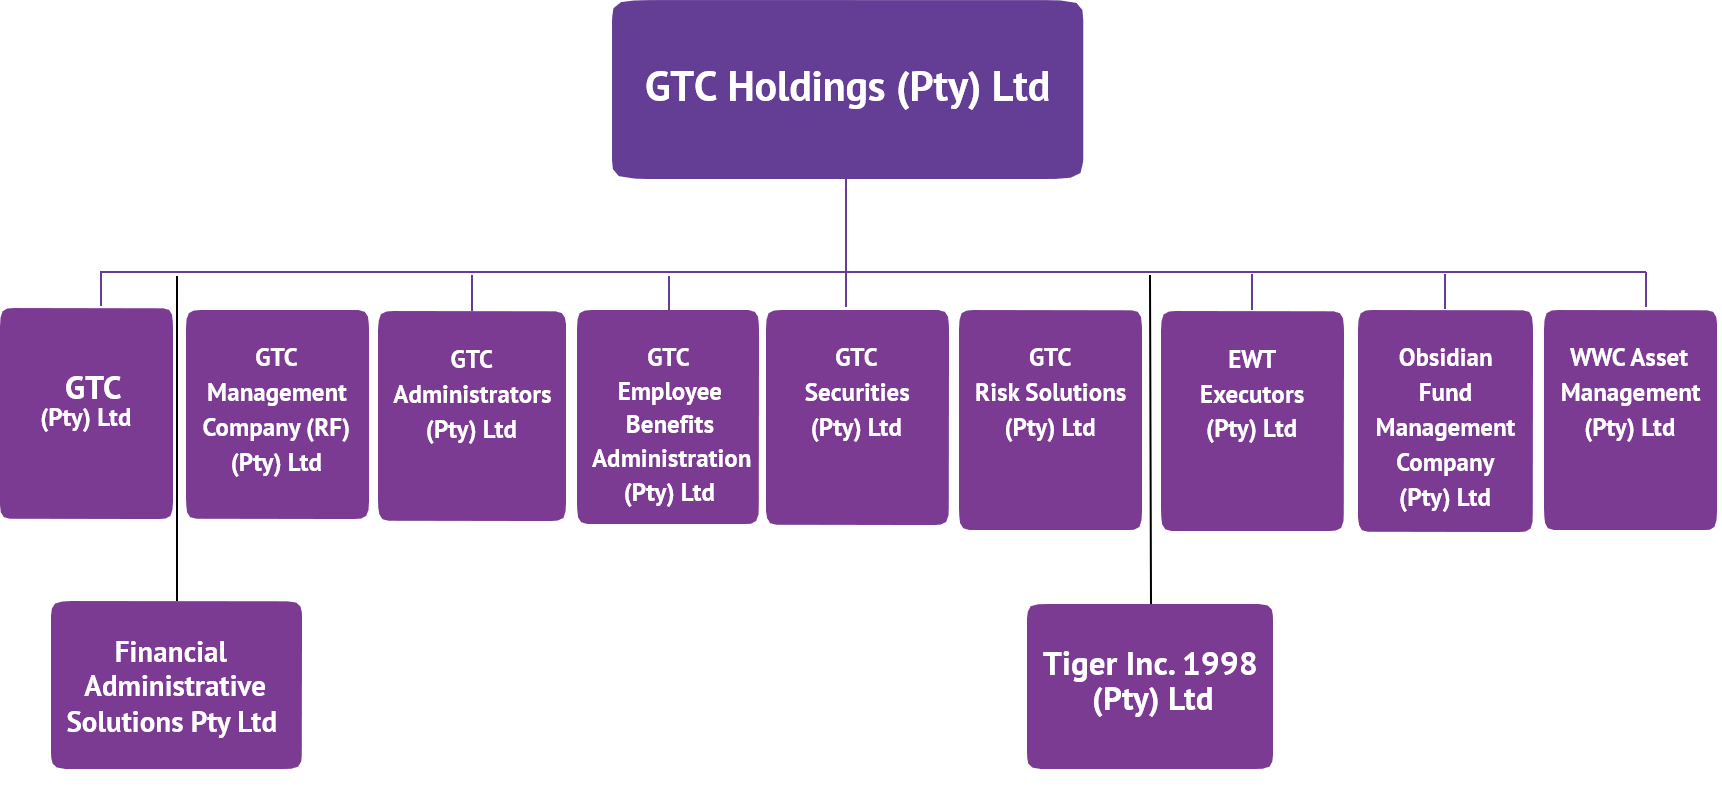 GTC organogram